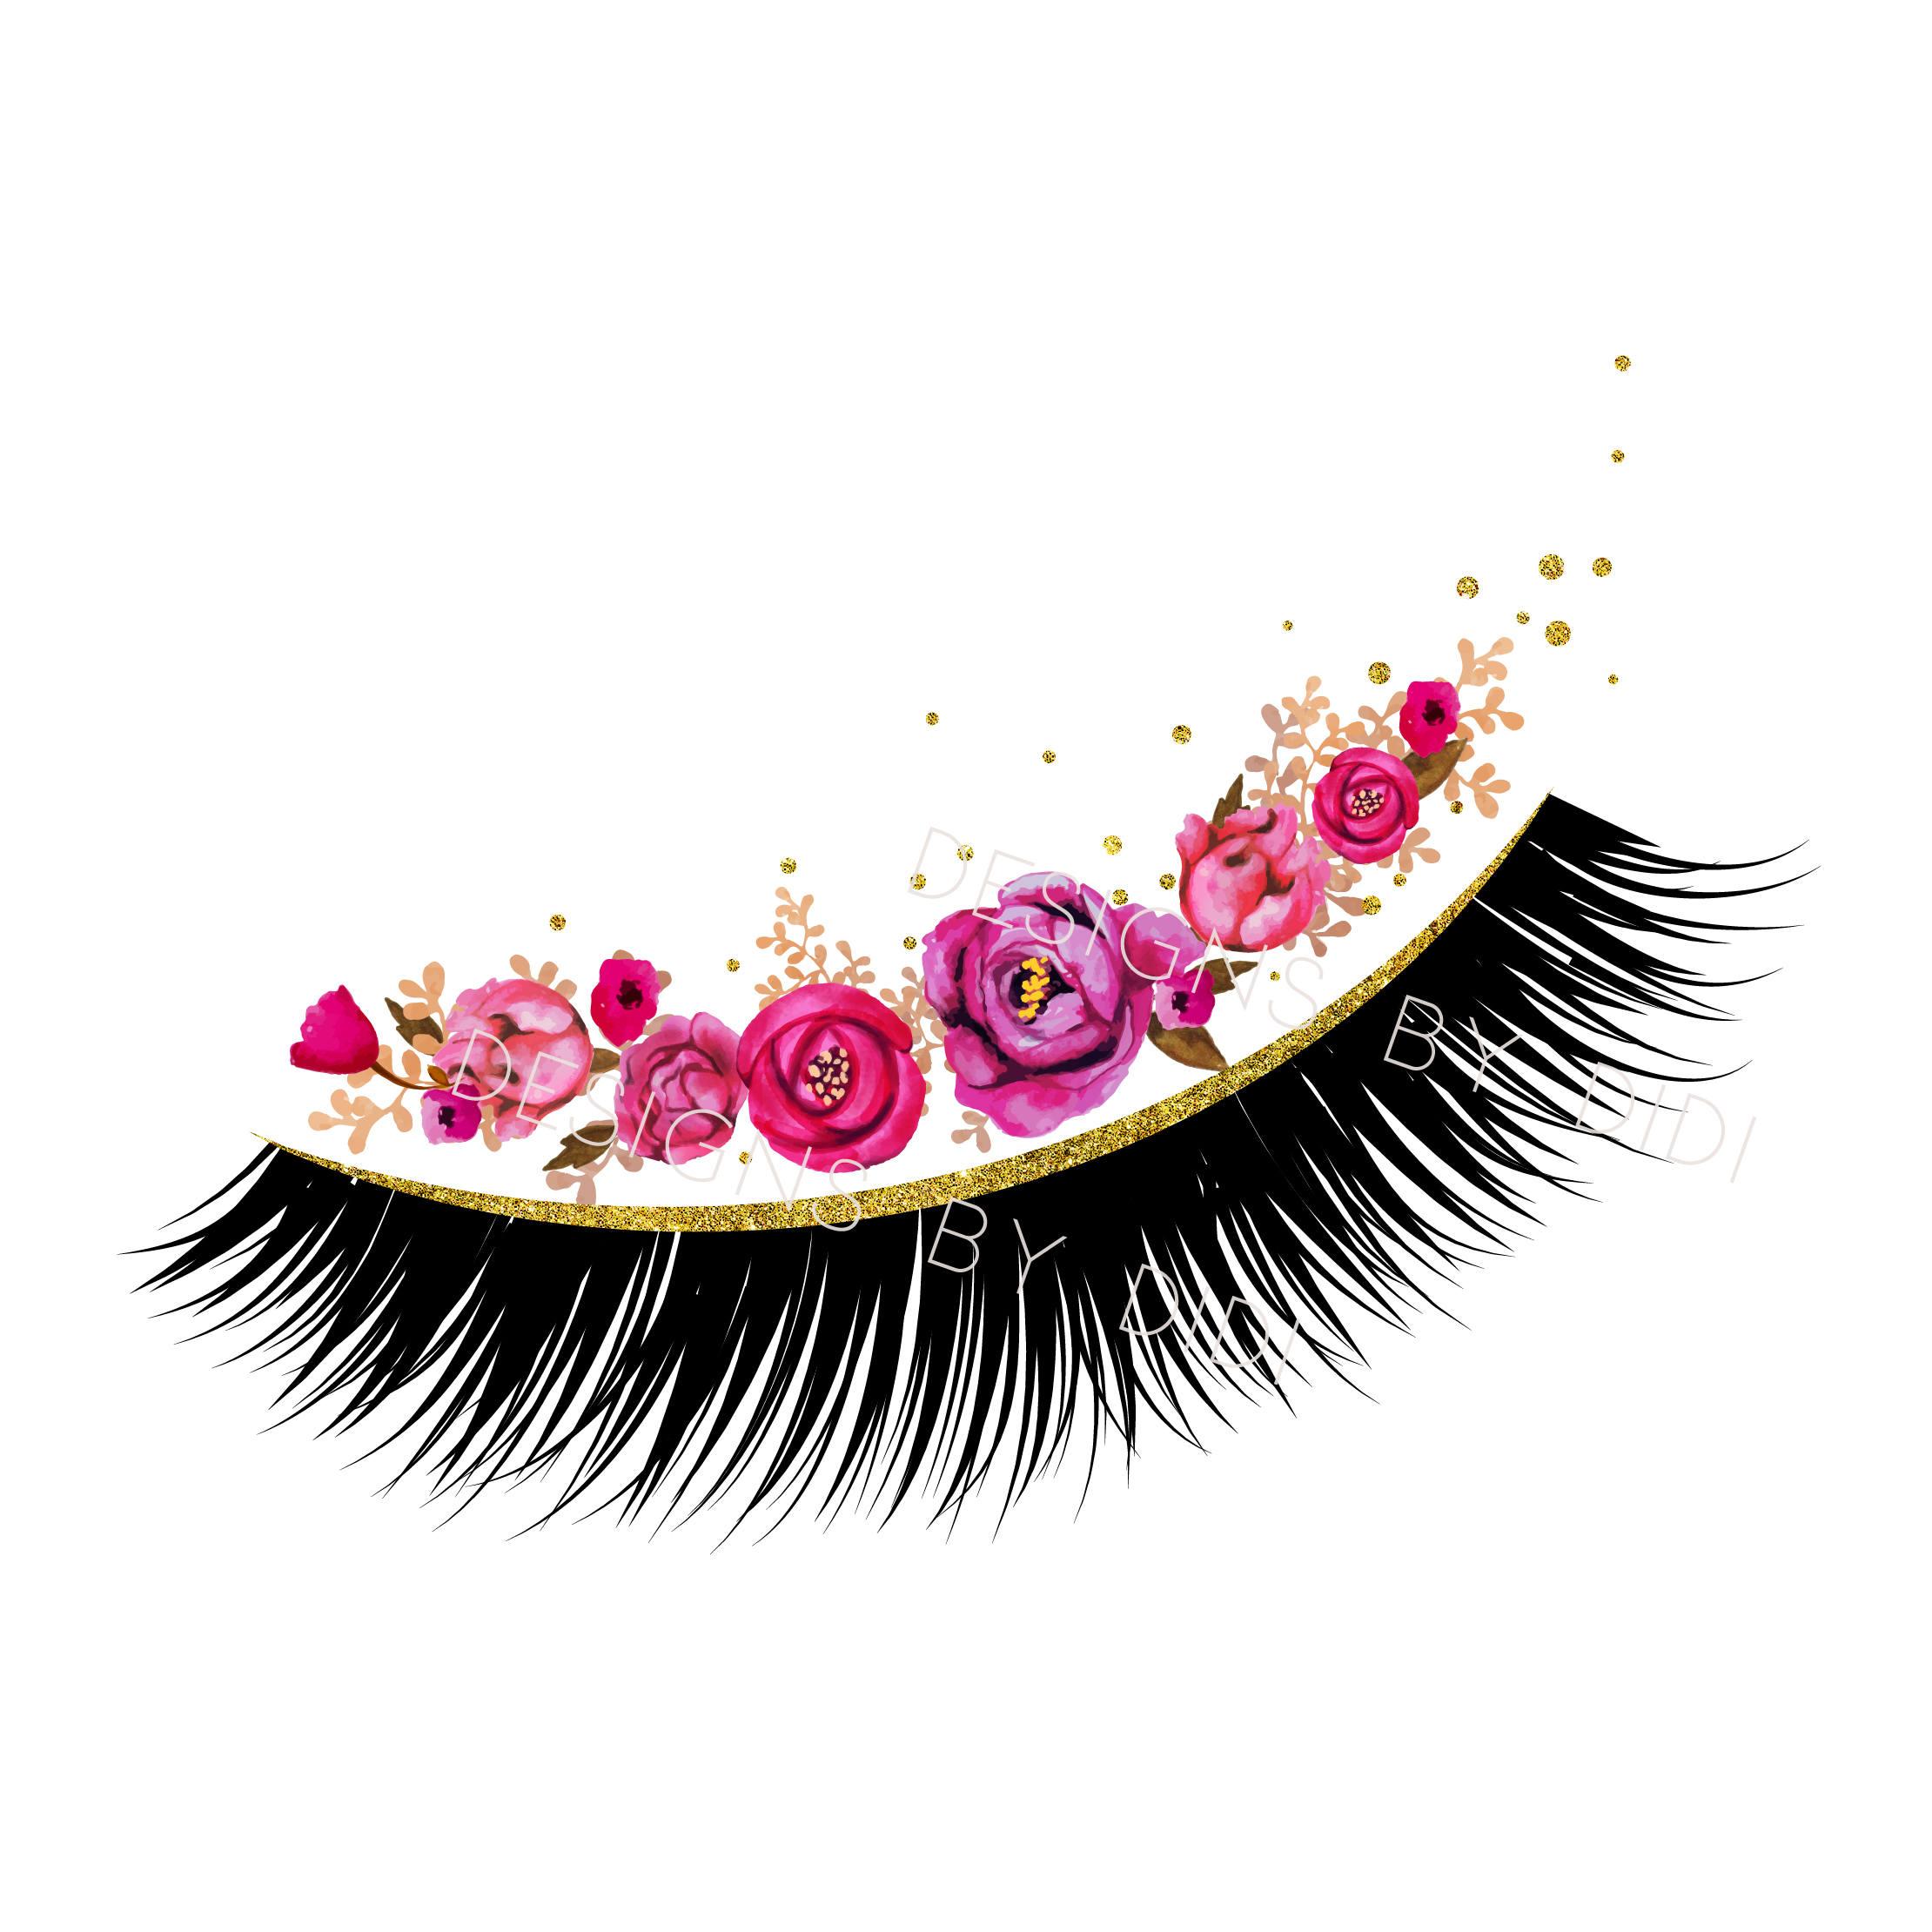 Instant Download, Lash Clipart, pink gold lashes clip art, instant download  lashes clip art, lashes image, lash logo pink gold.